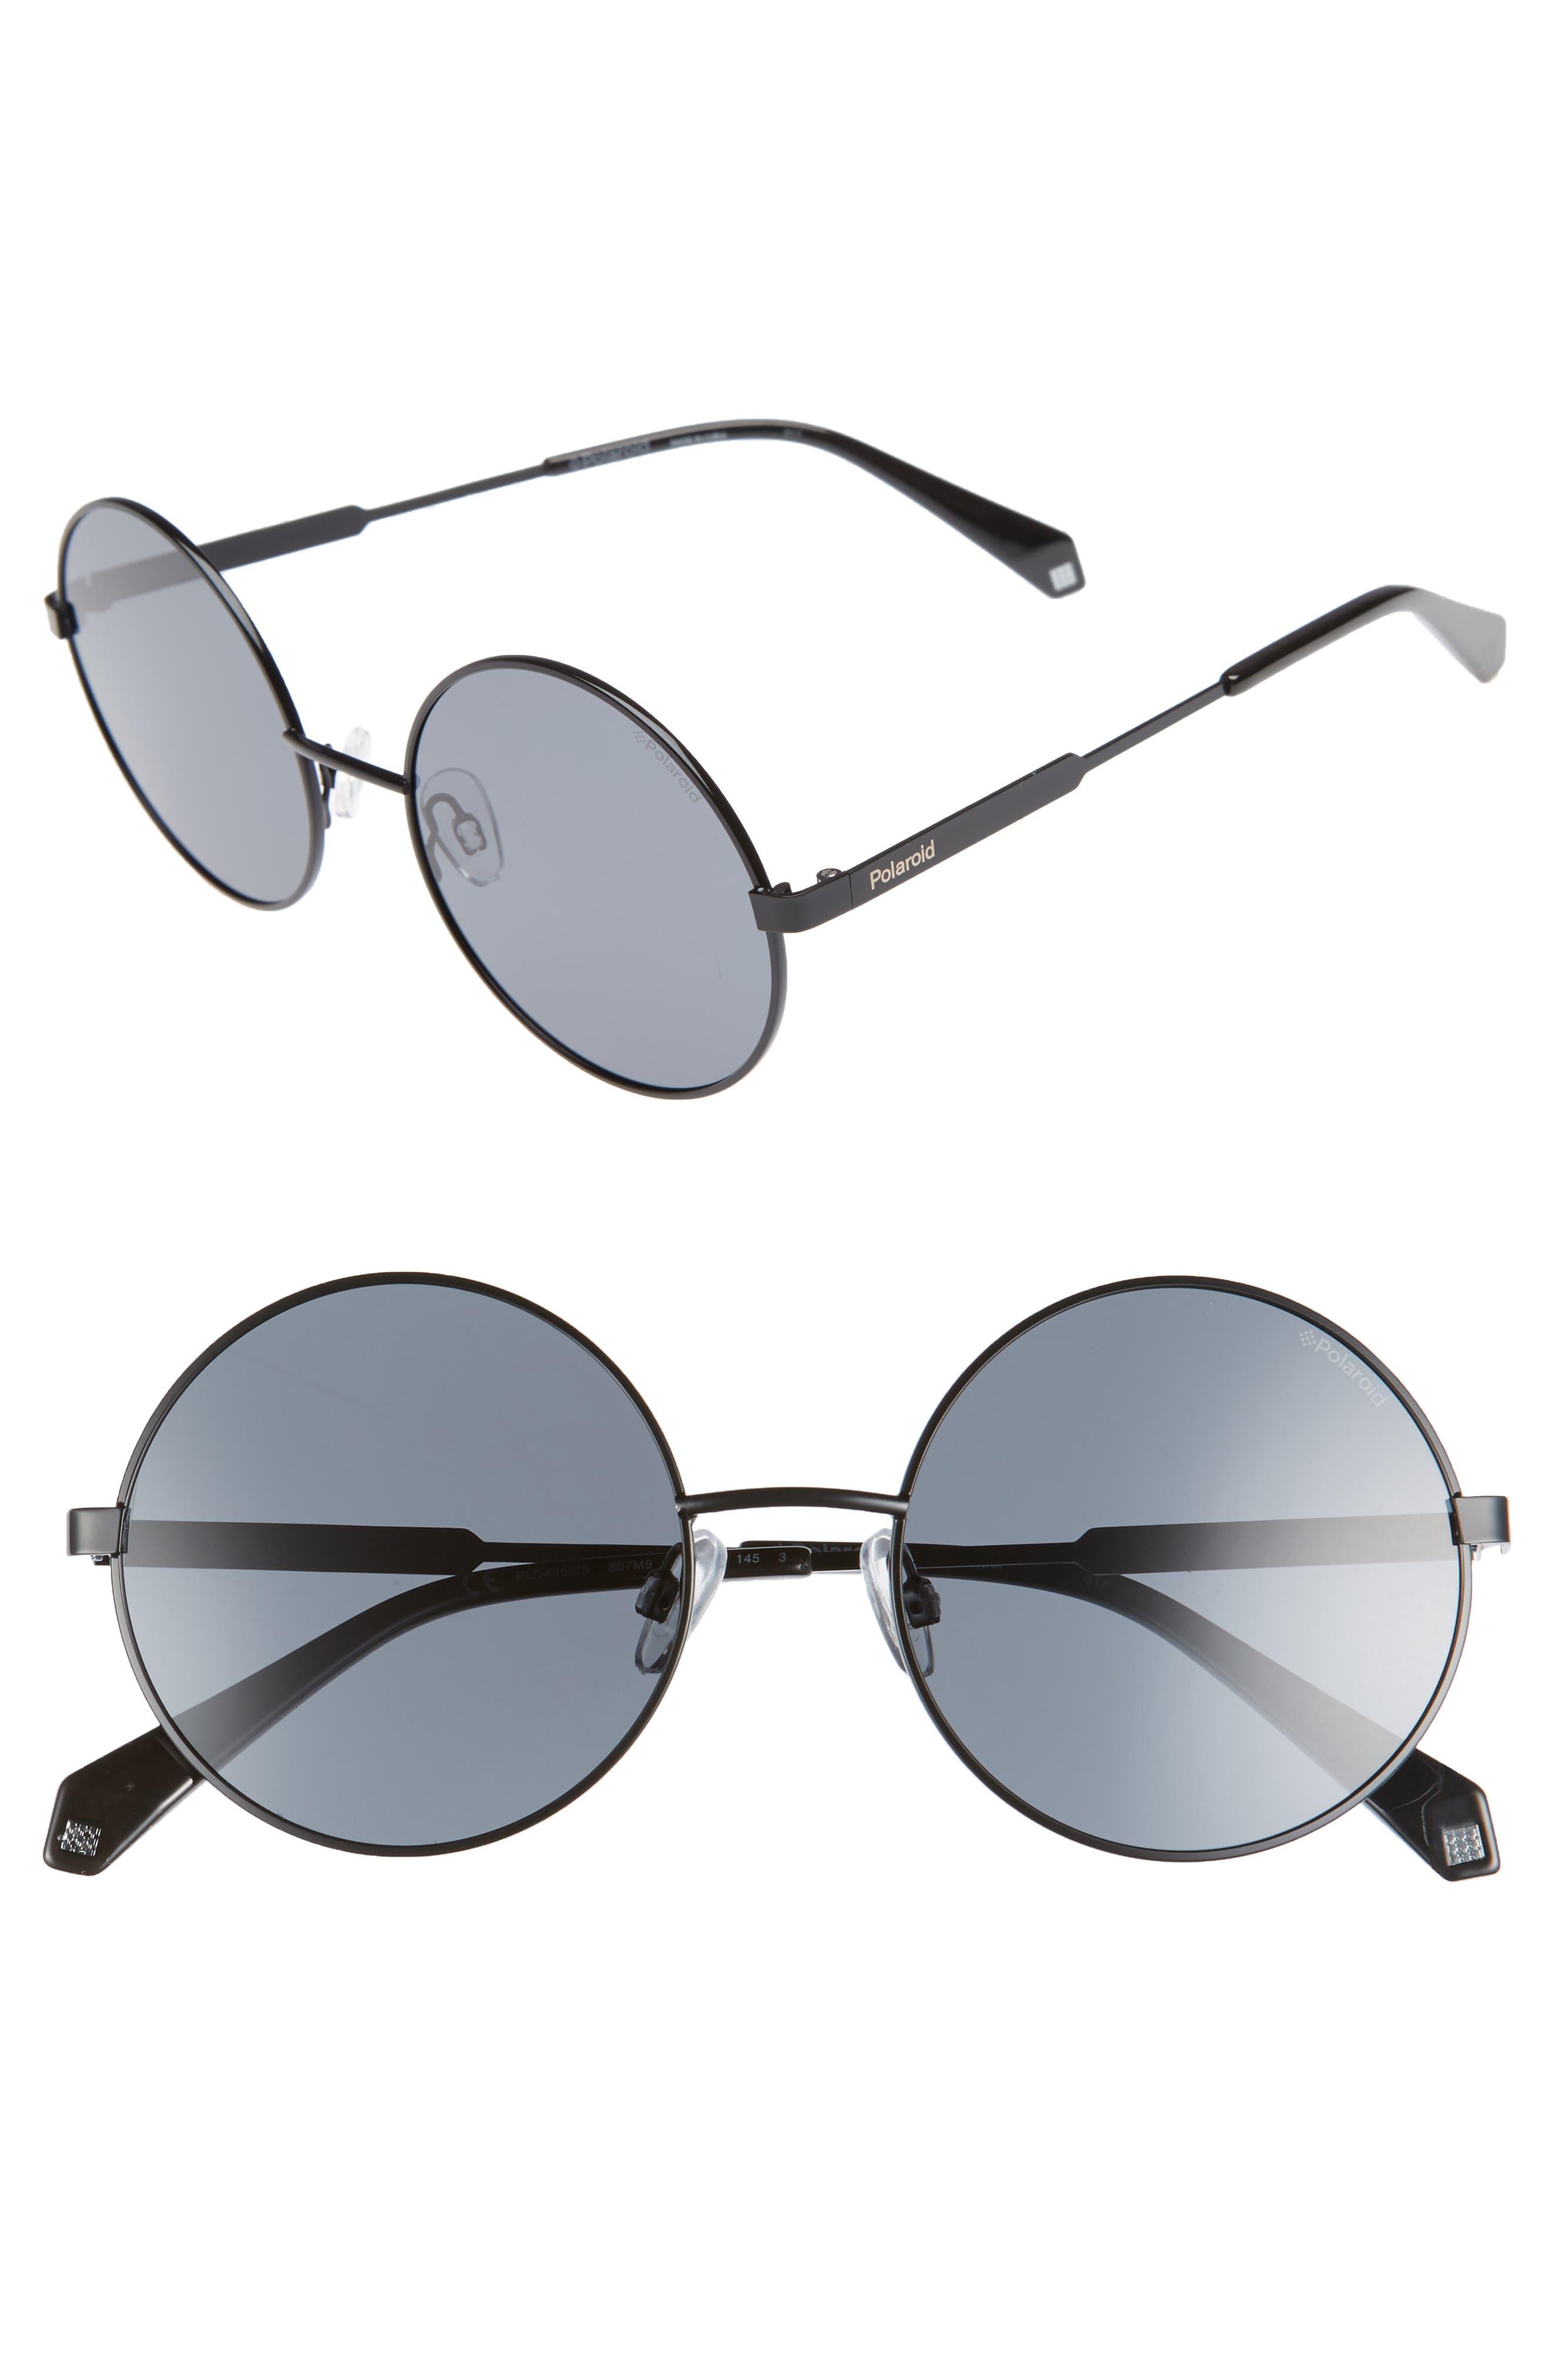 Main Image - Polaroid 55mm Polarized Round Sunglasses